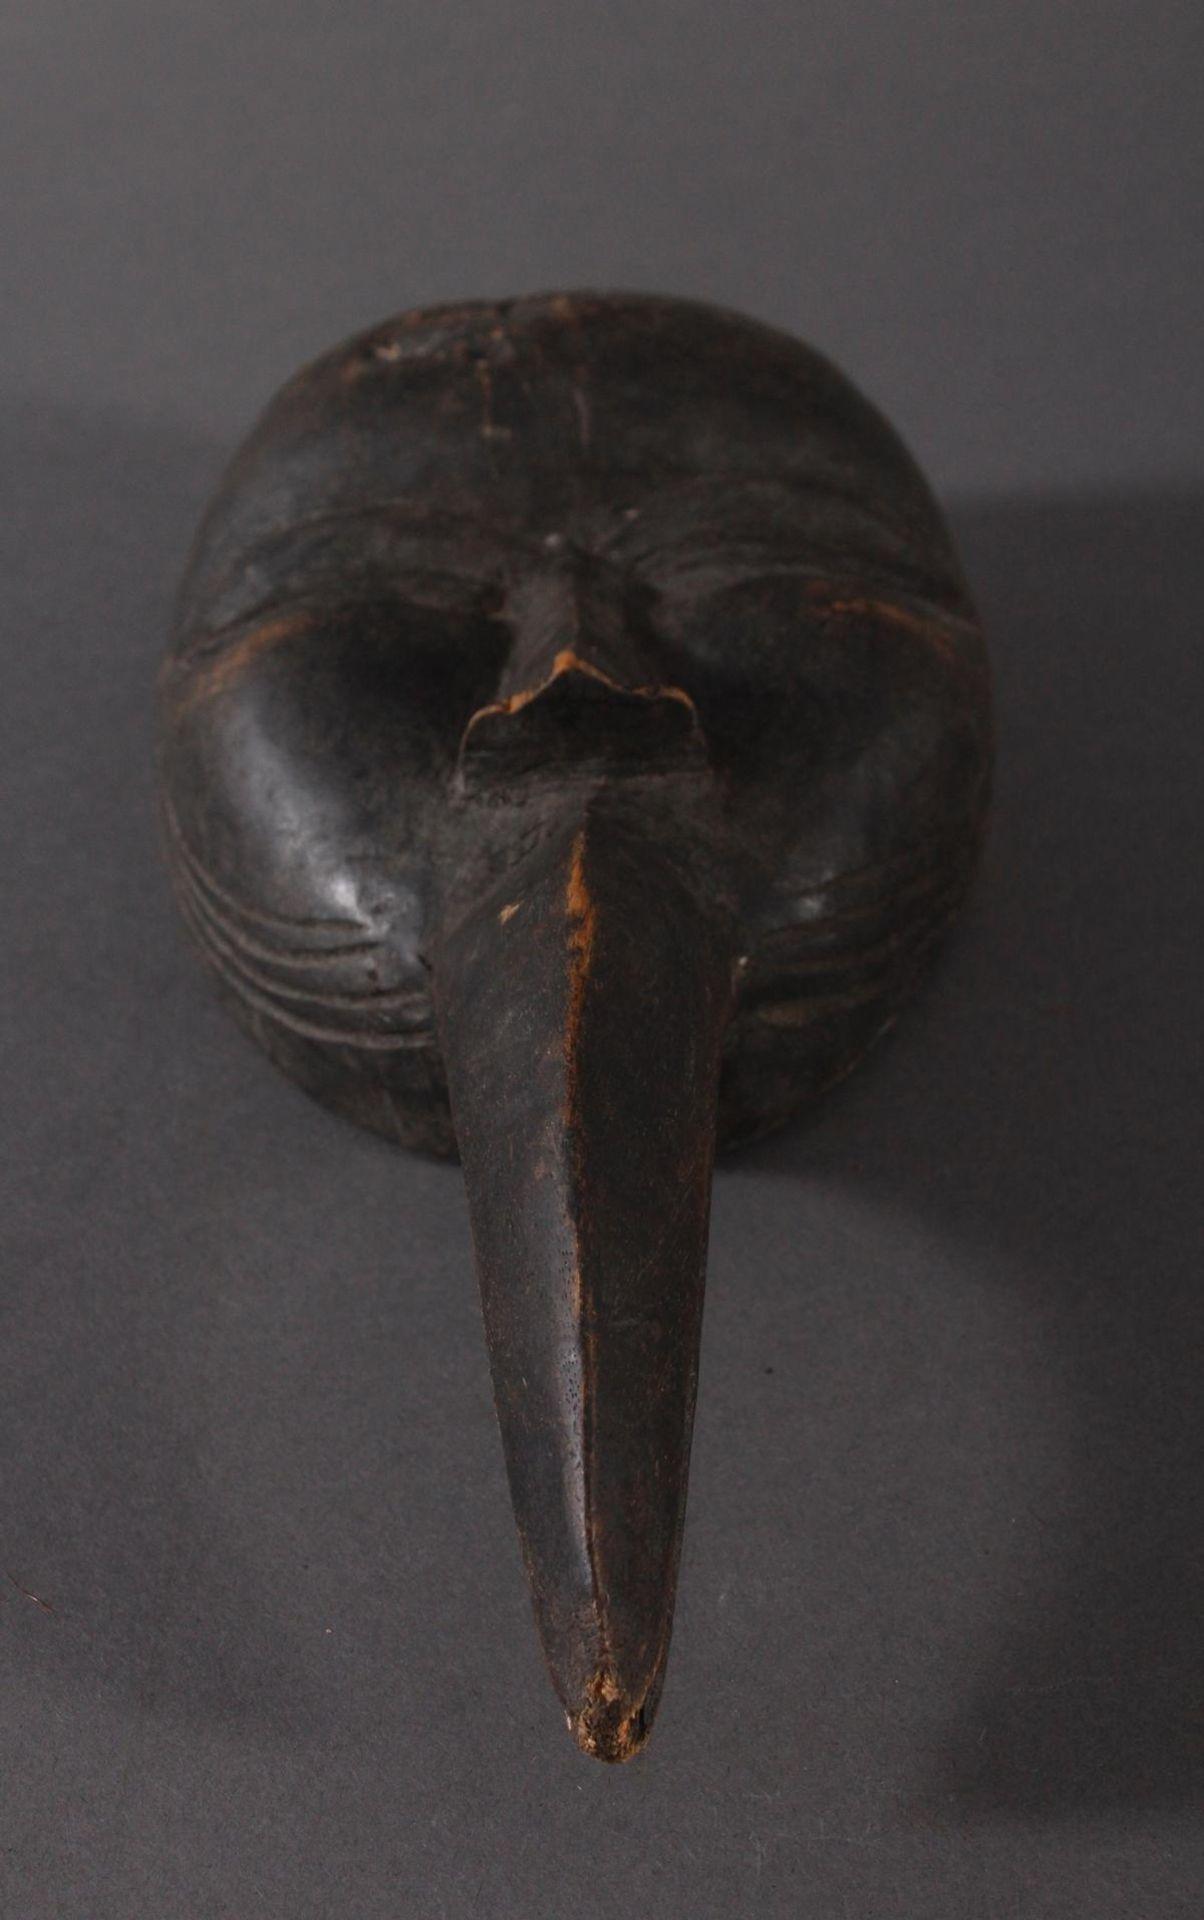 Antike Maske, Dan, Liberia 1. Hälfte 20. Jh.Holz geschnitzt, dunkle Patina, Schnabelmaske, ca. 6 x - Bild 4 aus 6